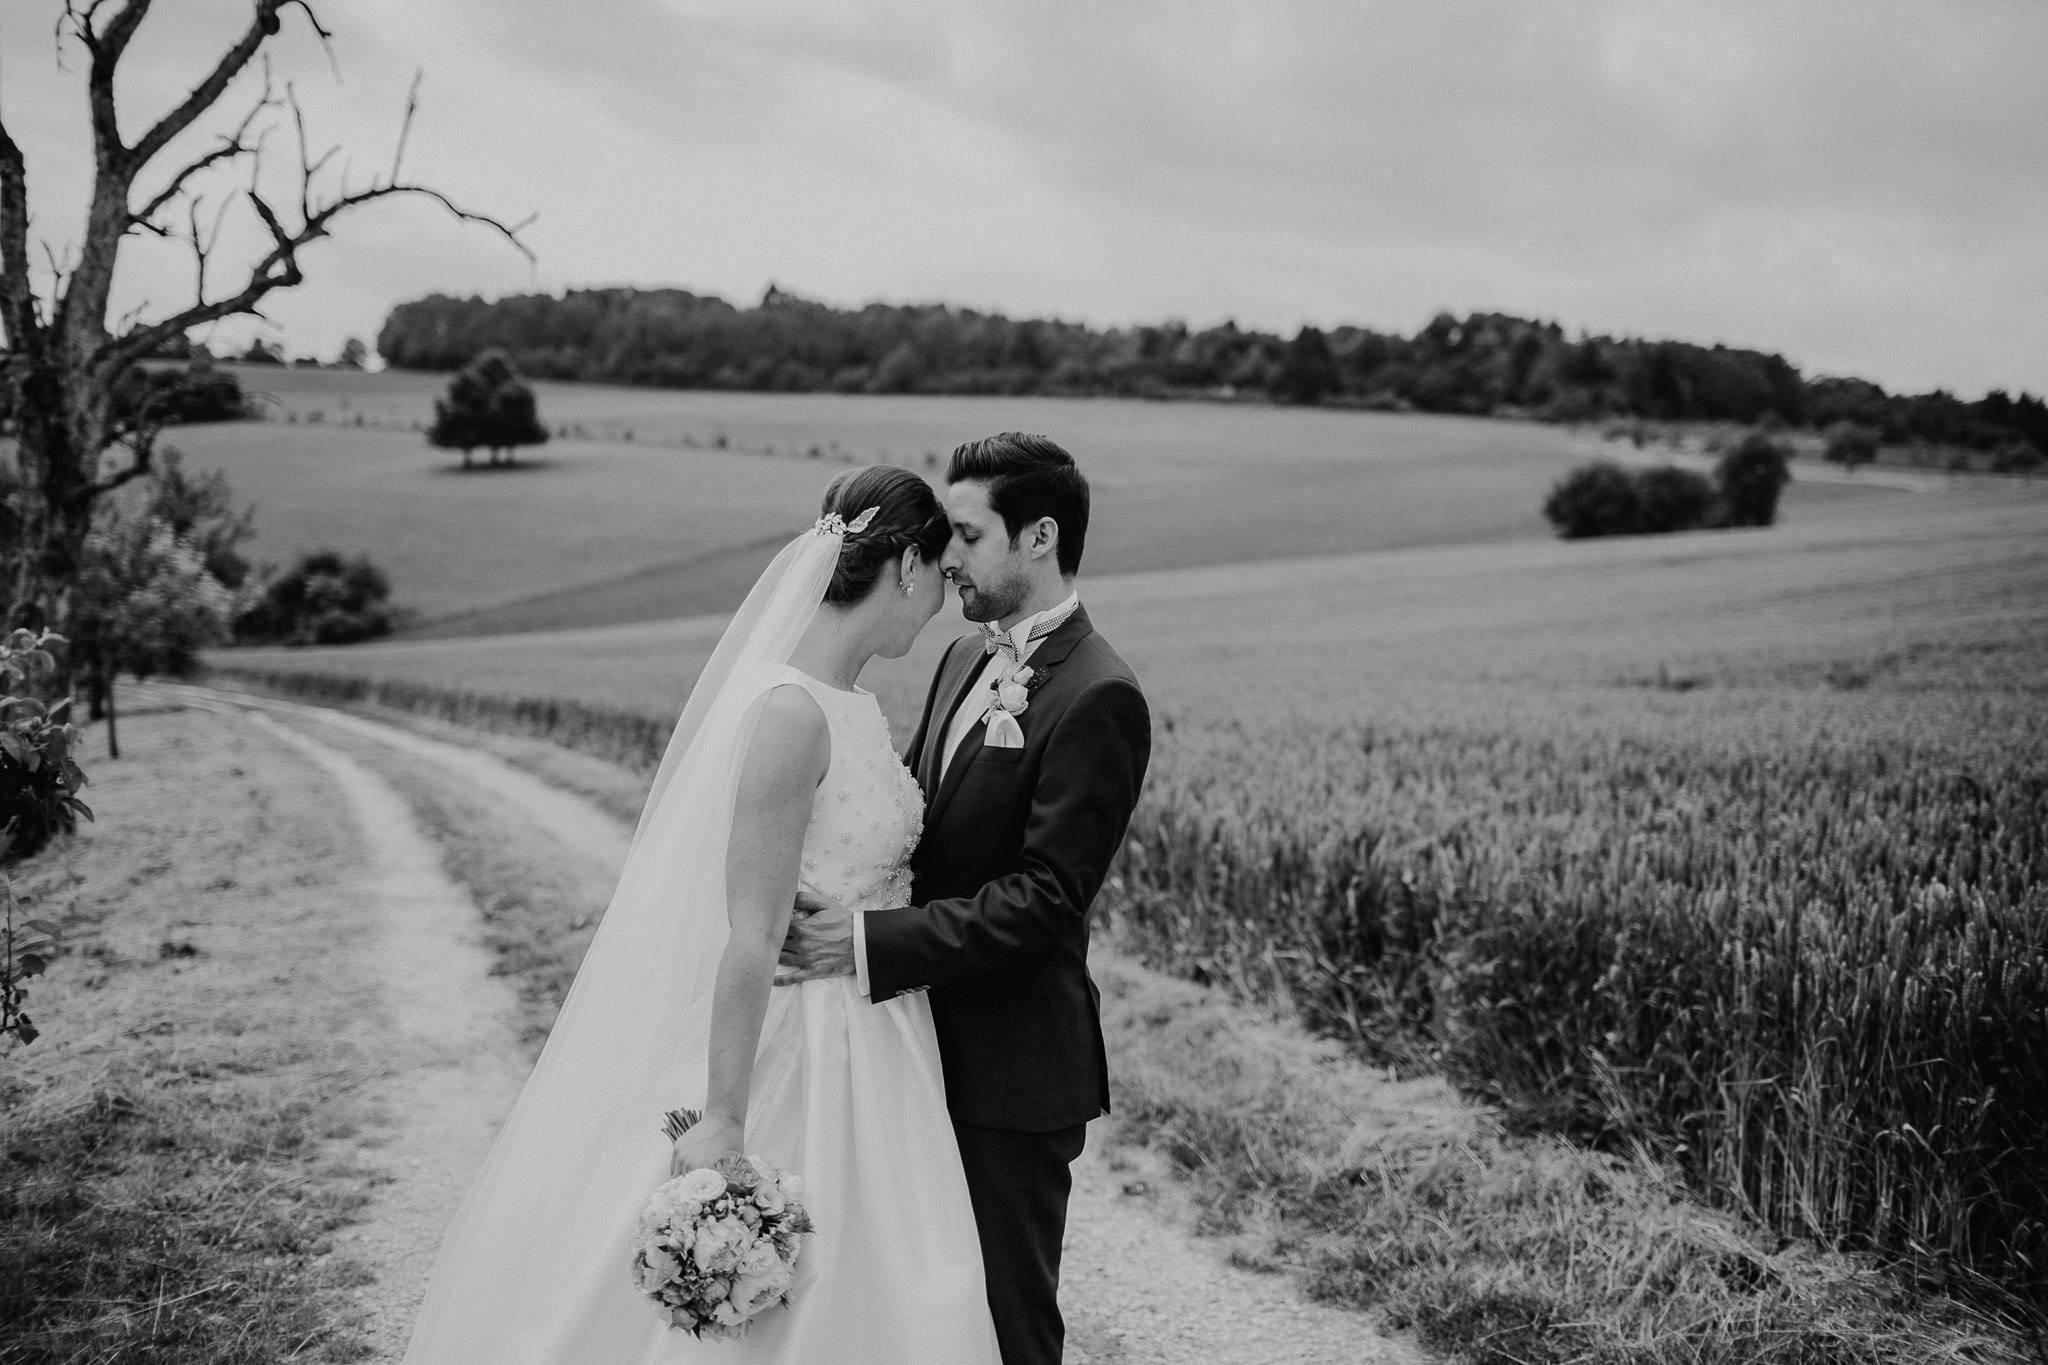 wedding photographer hamilton new zealand 1019 4